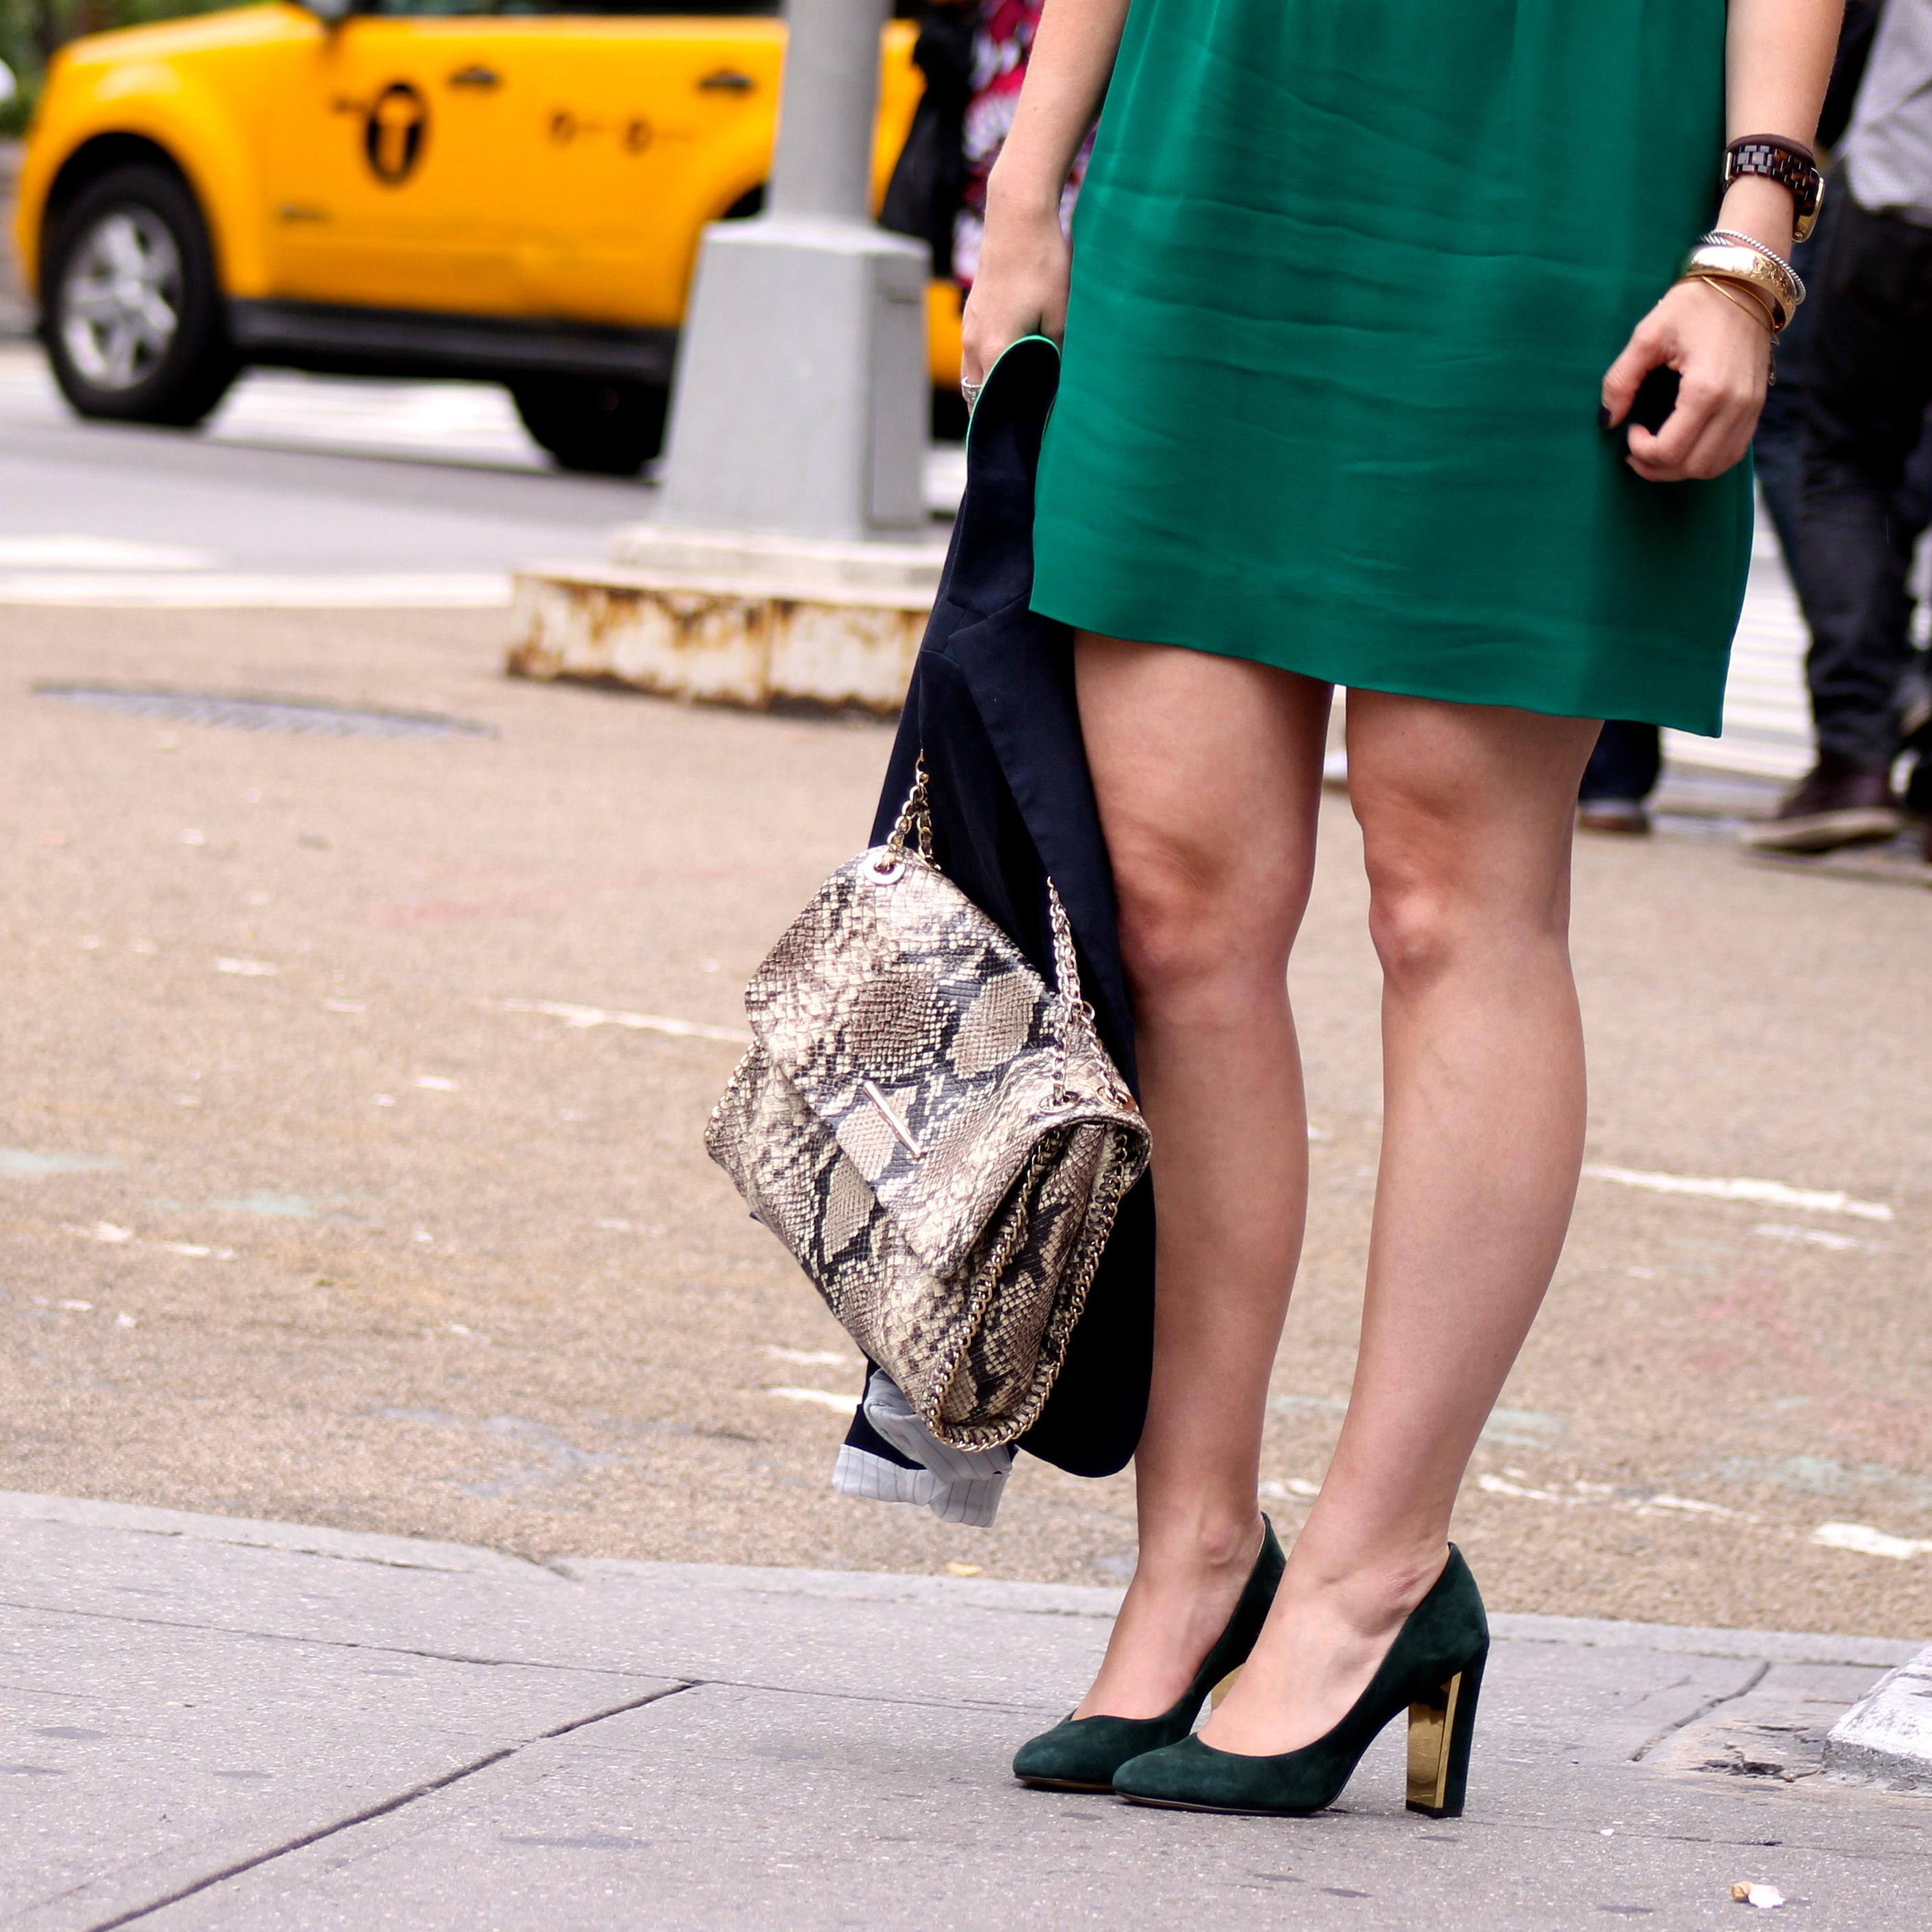 outfit: little green dress